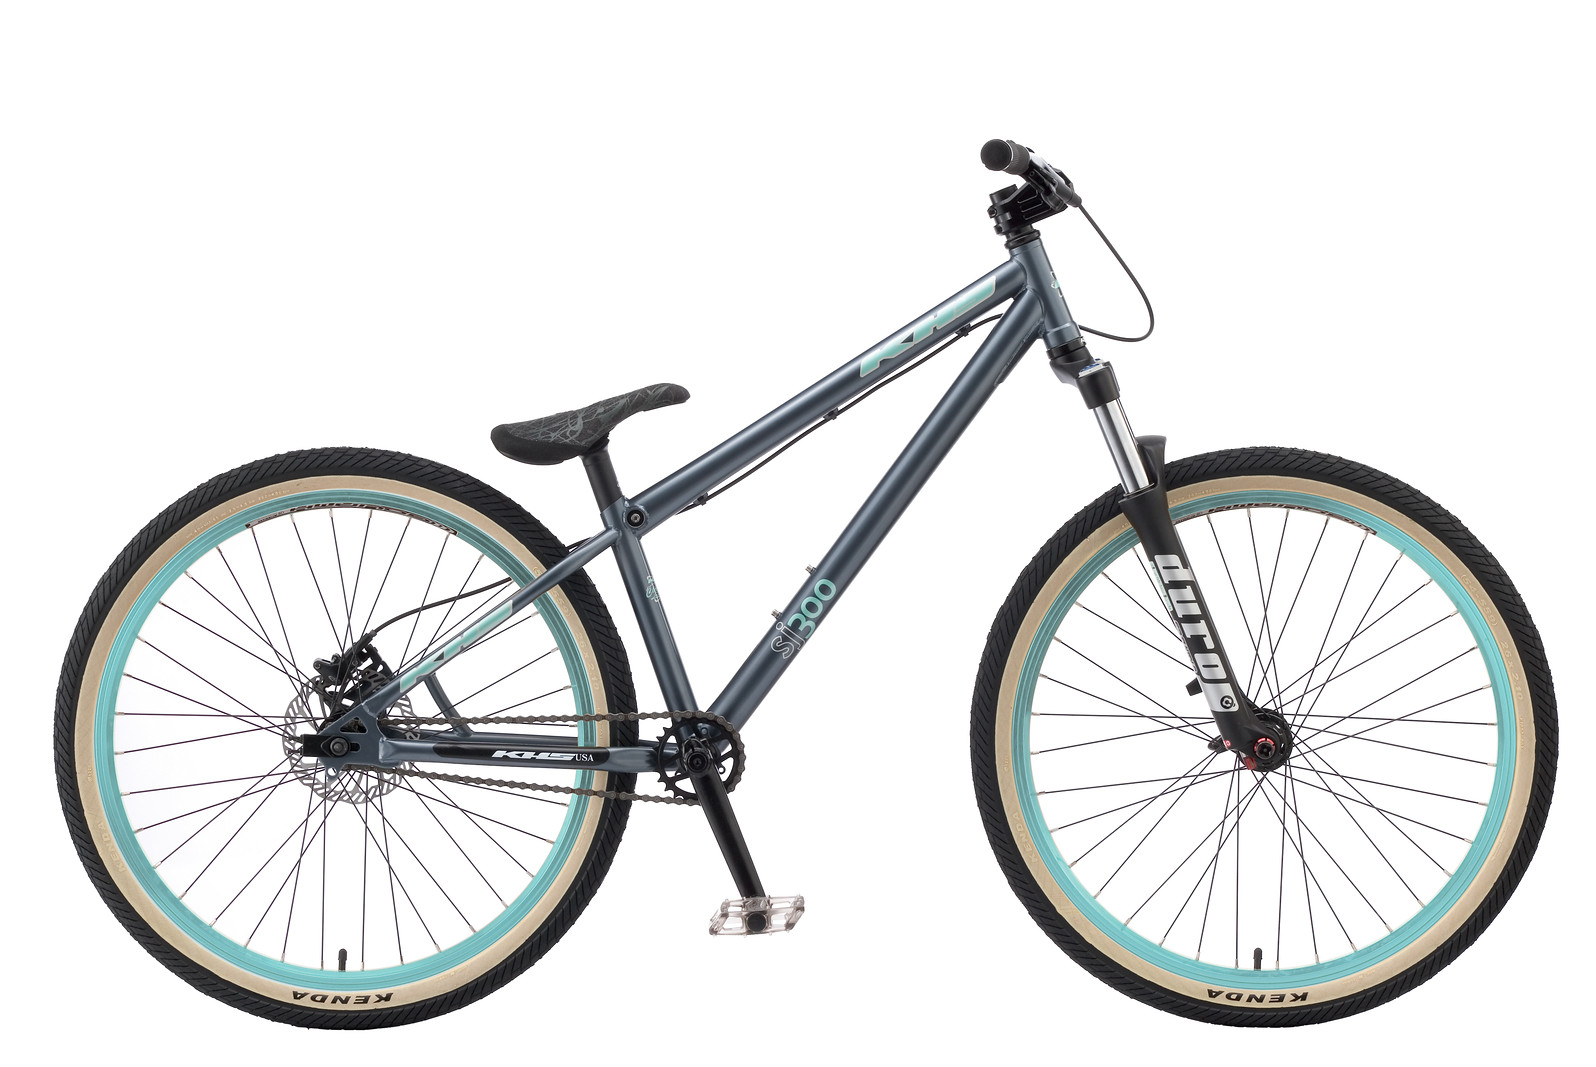 2013 KHS SJ300 Bike 2013 SJ-300